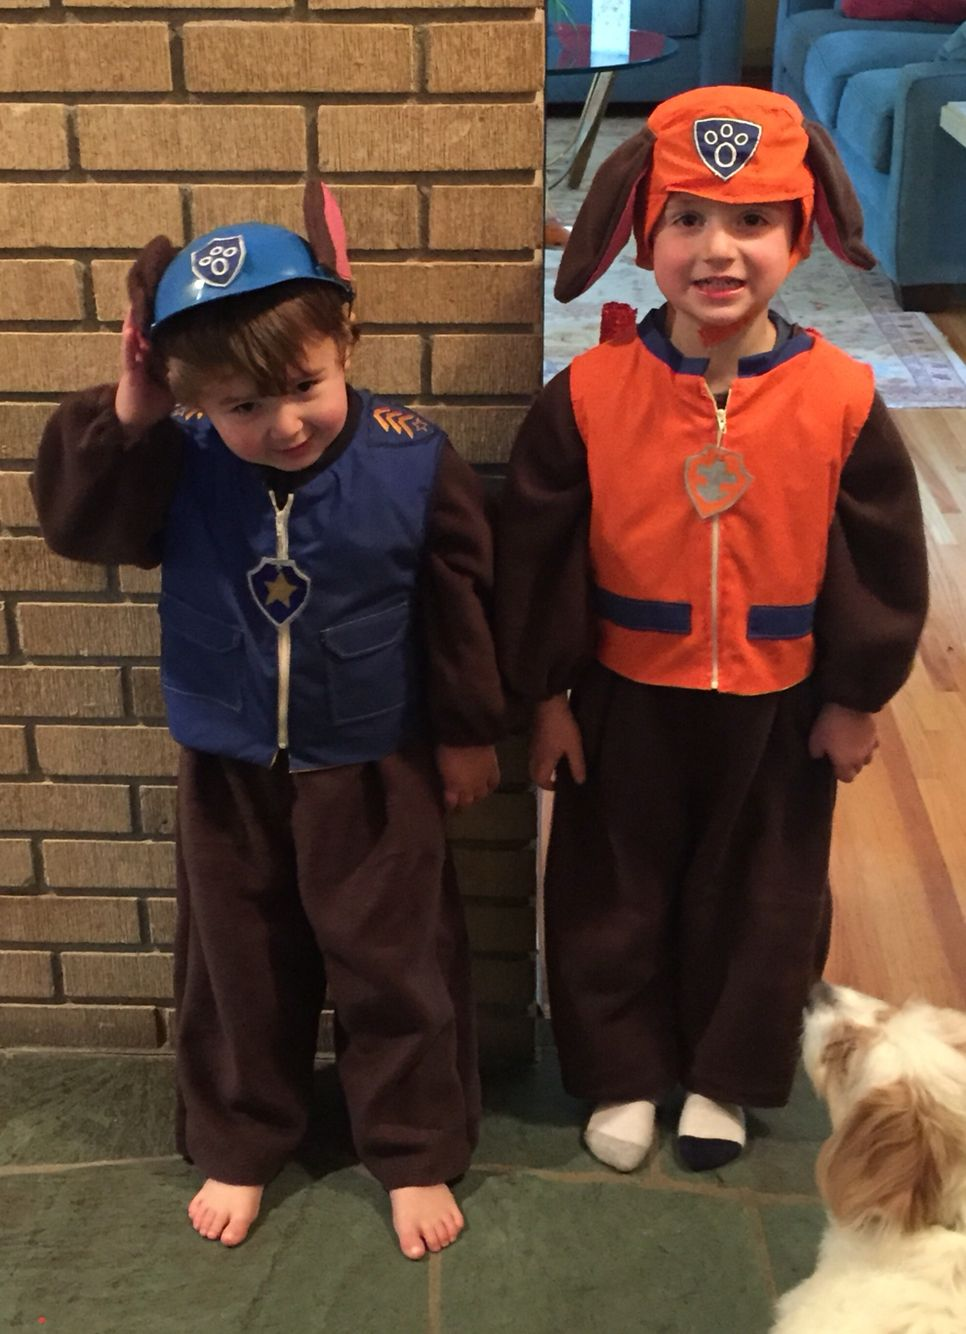 homemade paw patrol zuma costume and chase costume